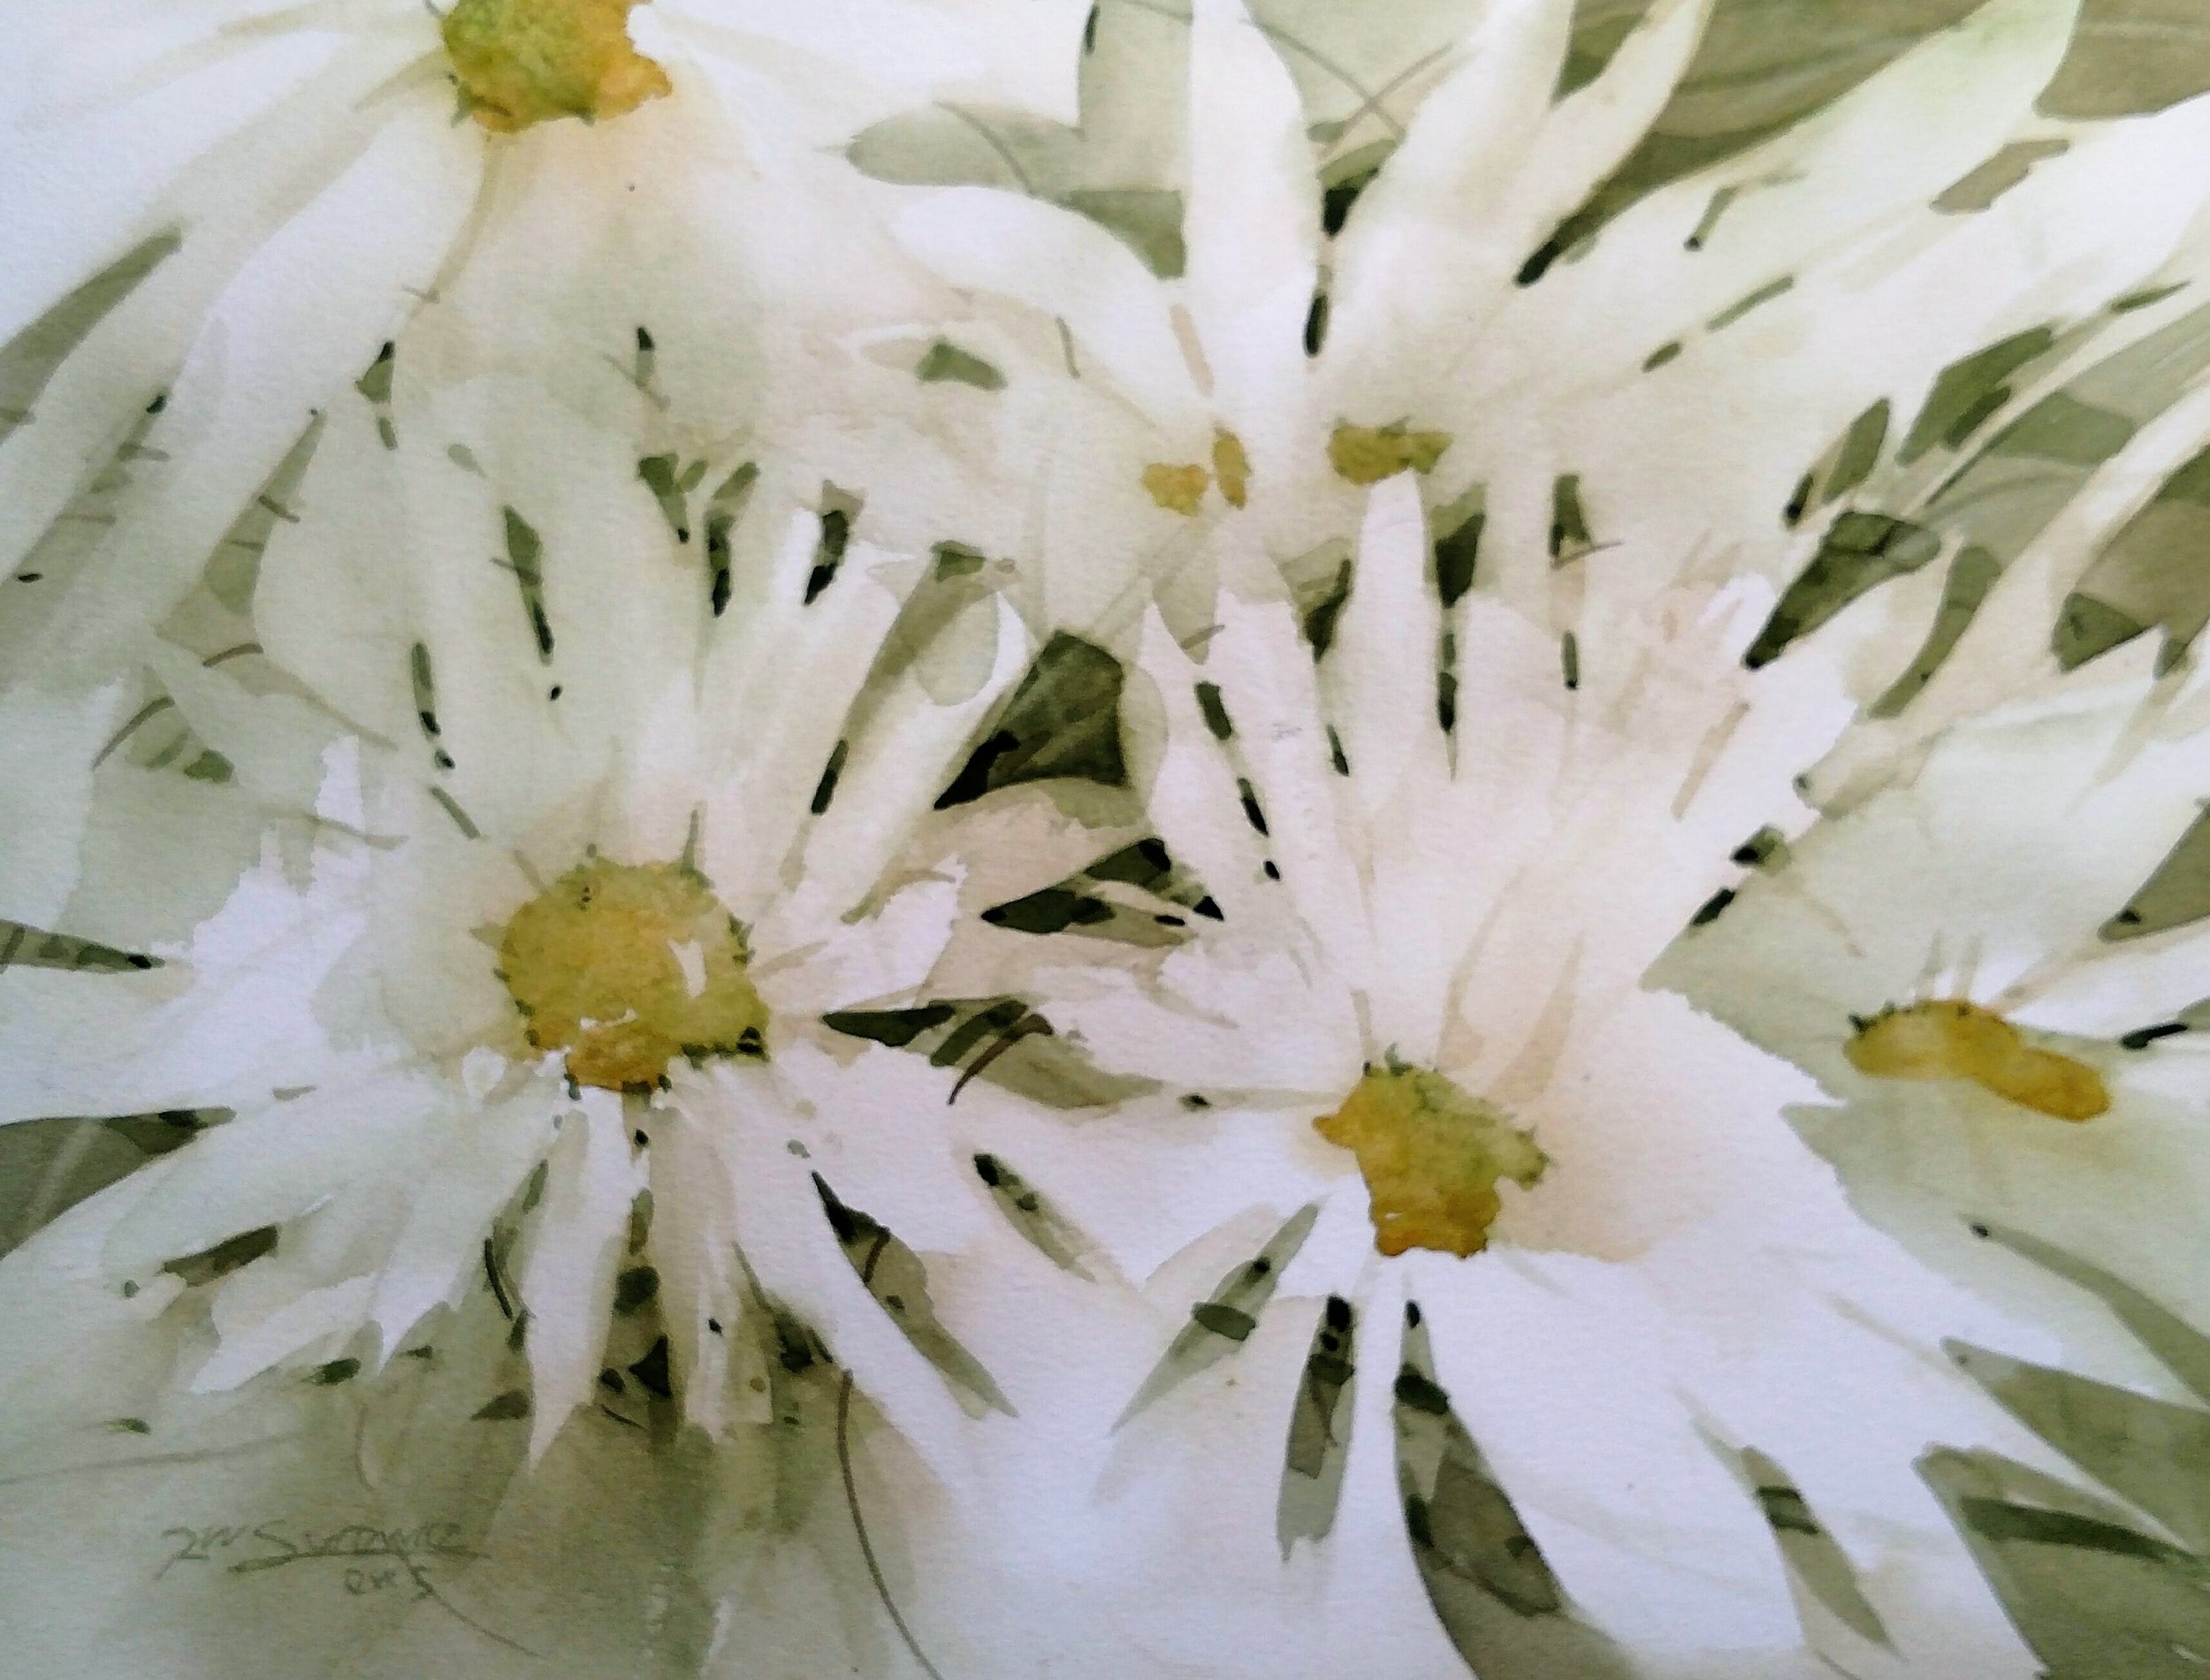 Bunch-of-Daisies-video-1.jpg